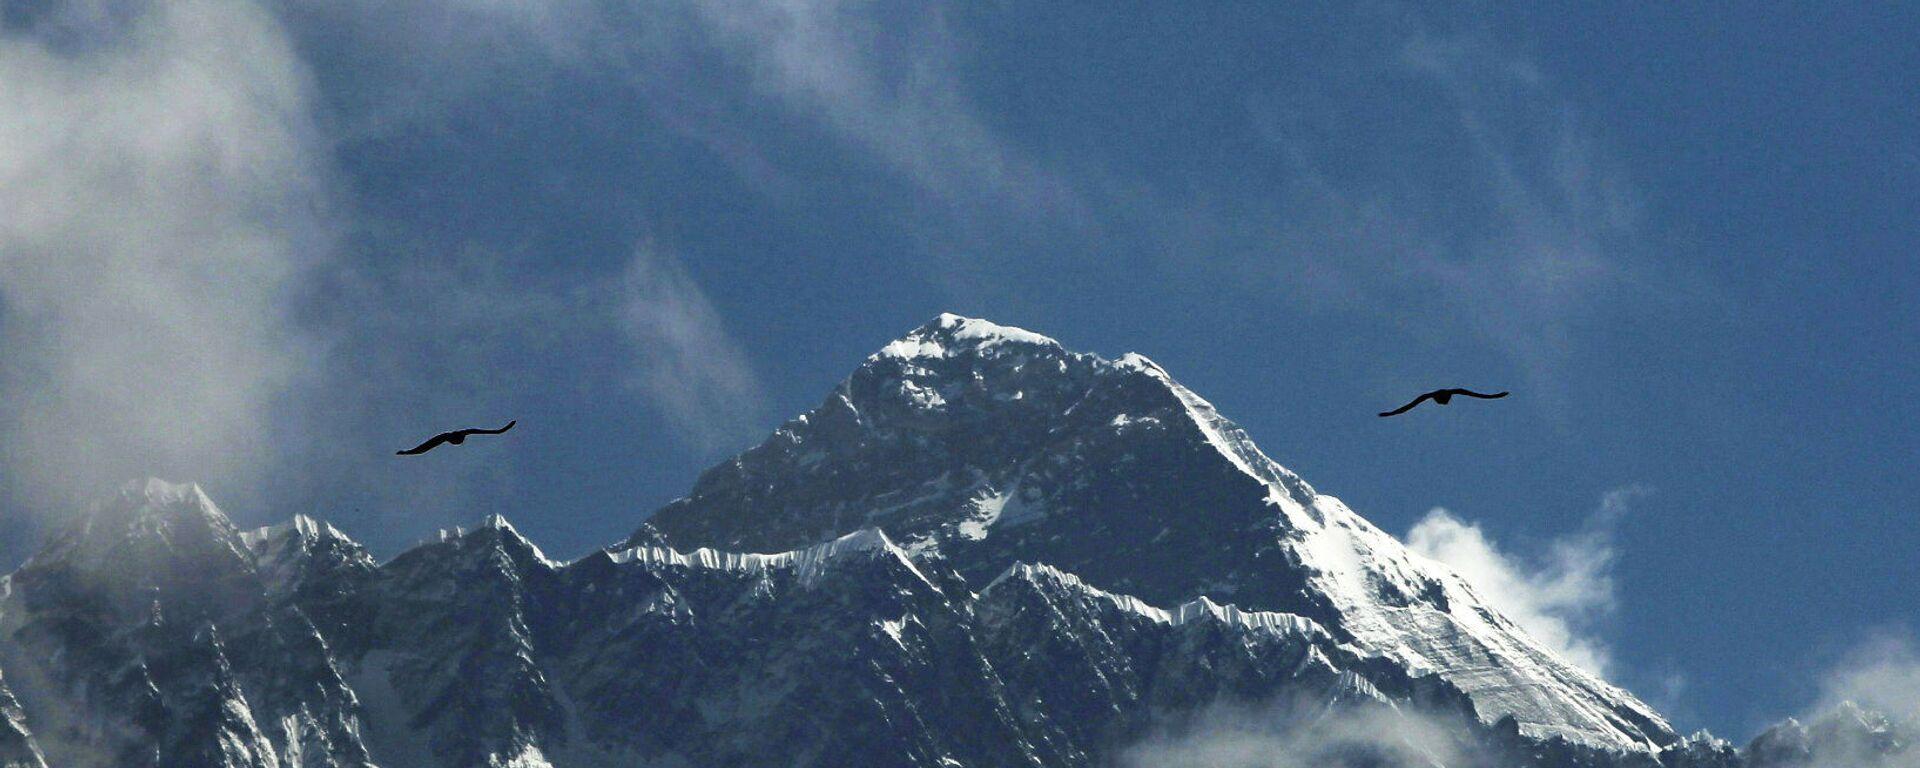 Uccelli sopra l'Everest - Sputnik Italia, 1920, 08.02.2021